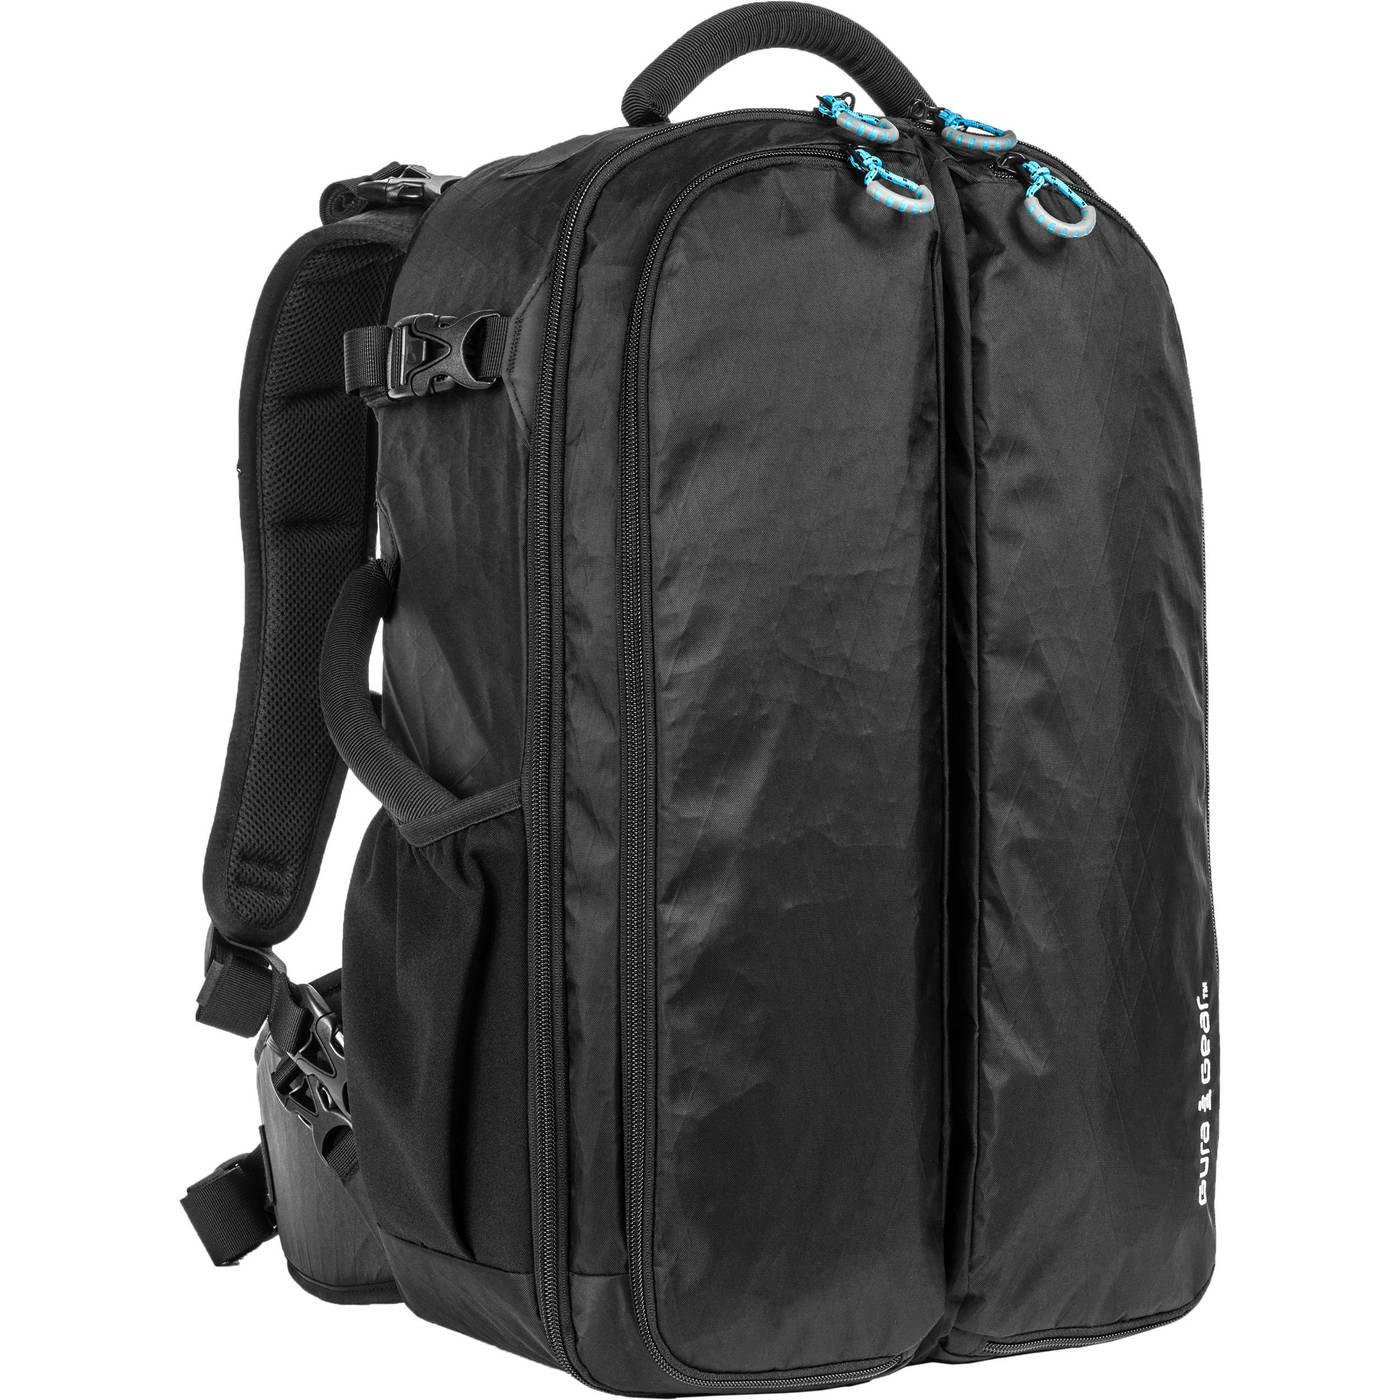 b9786914acff 30L Camera Backpack Design by Dan Curtiss at Coroflot.com